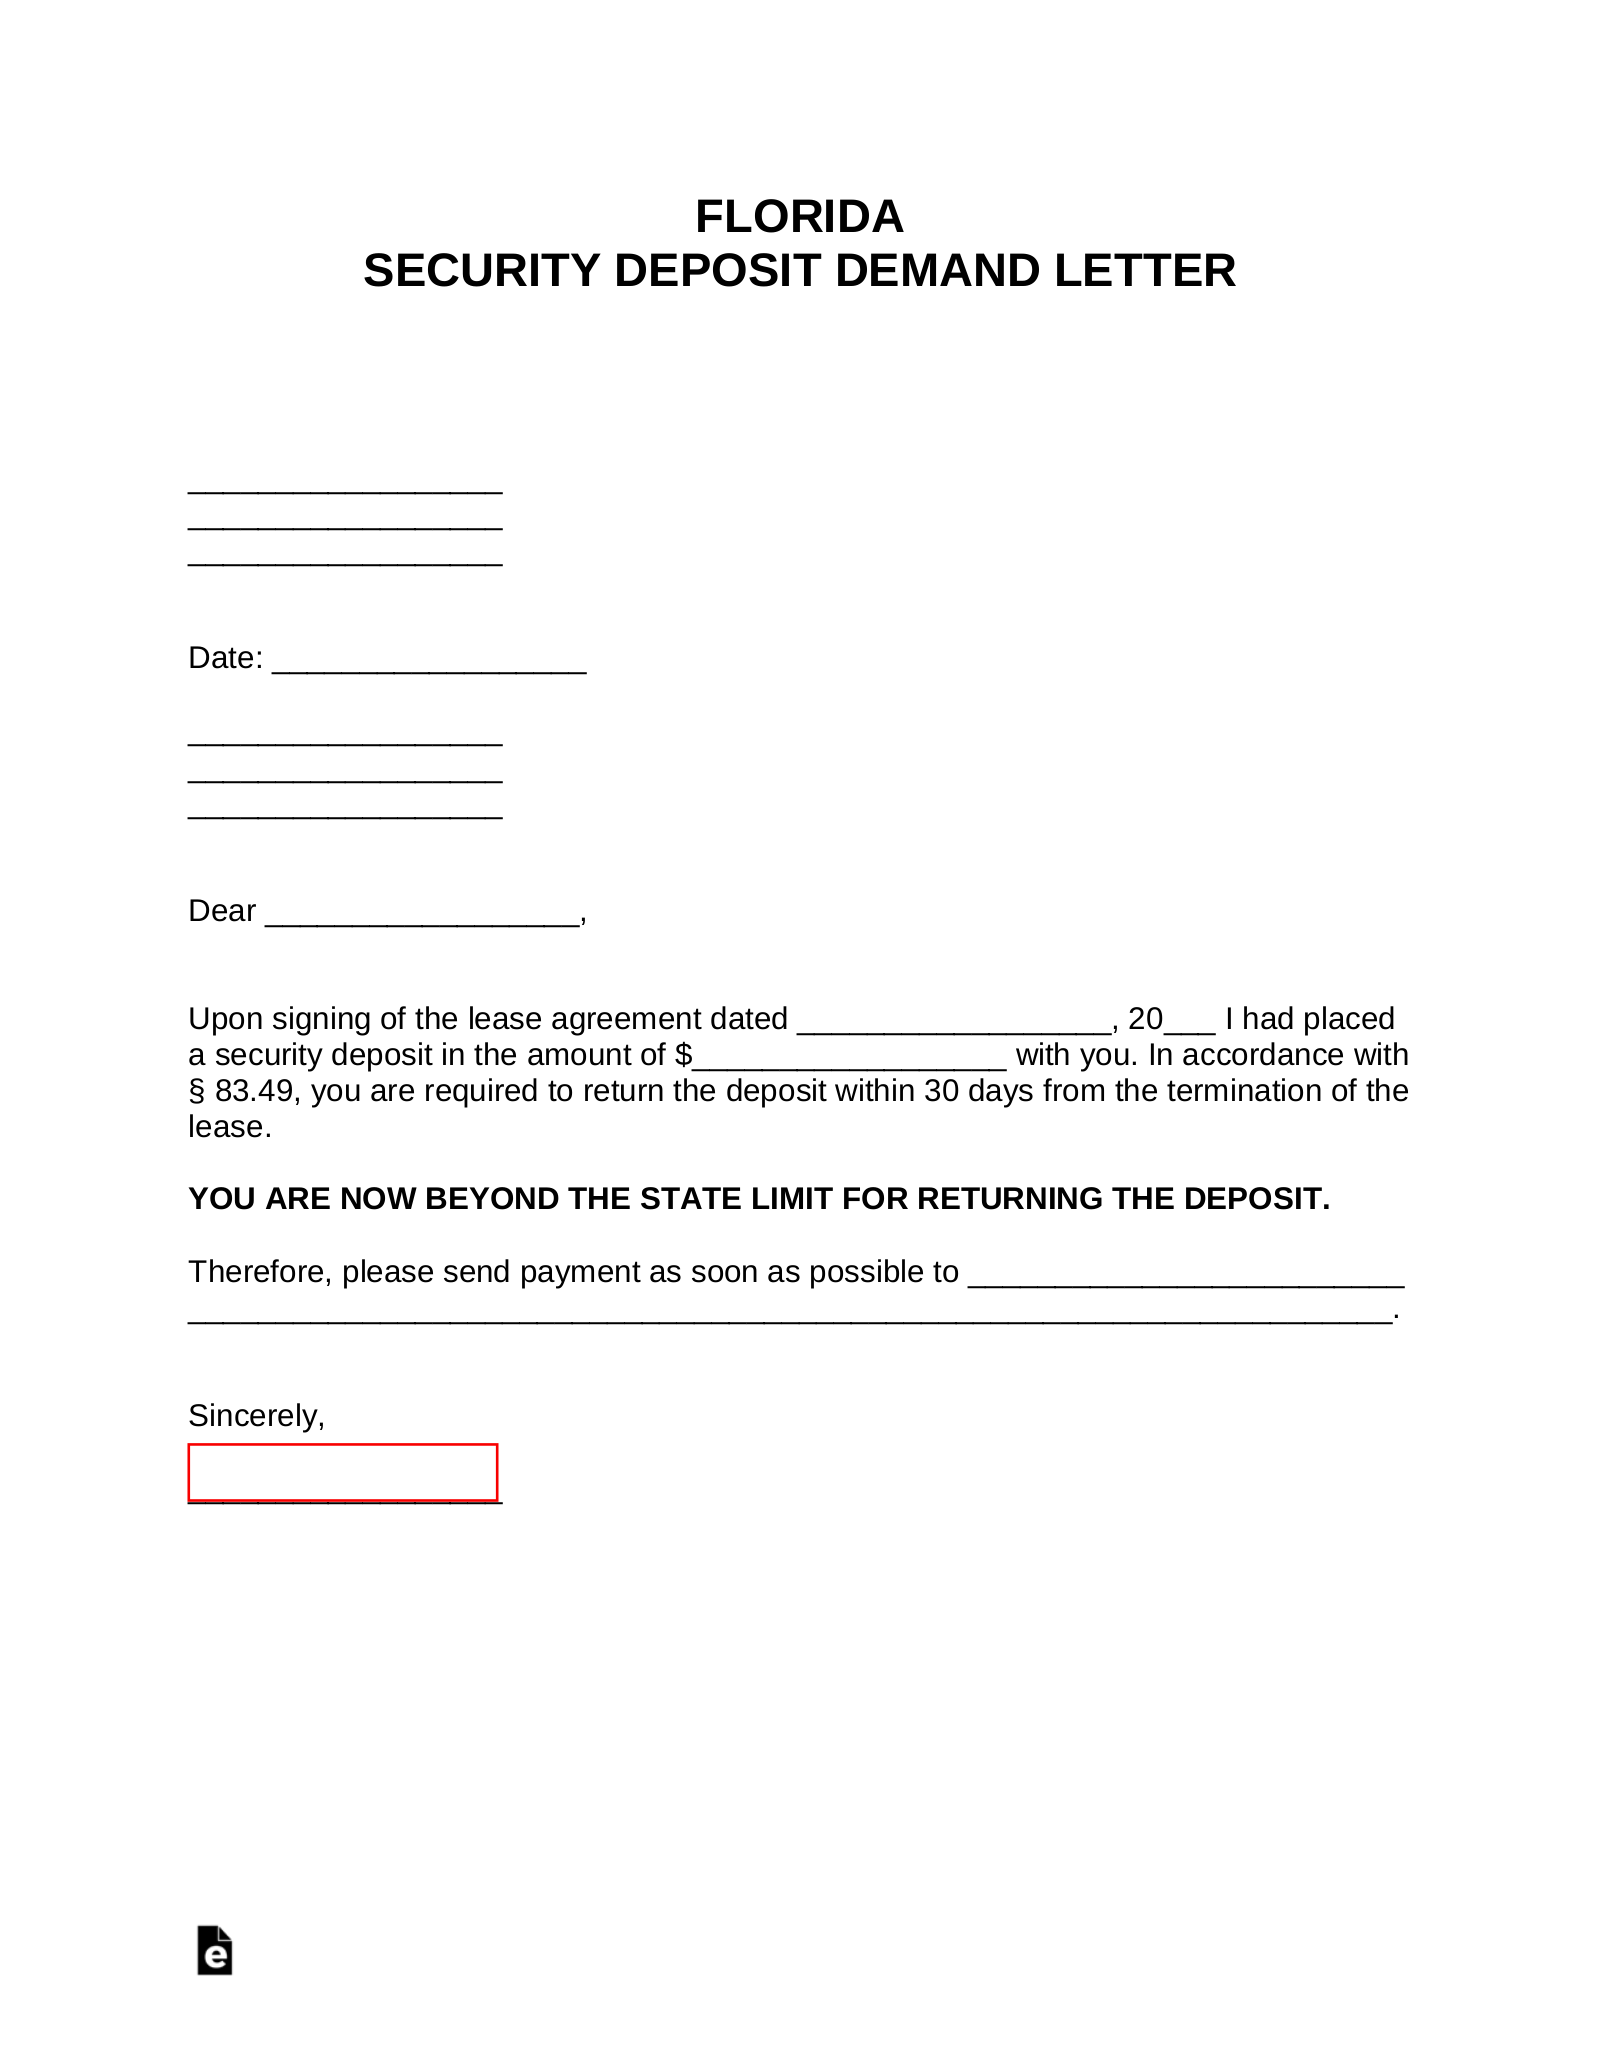 Florida Security Deposit Demand Letter from eforms.com